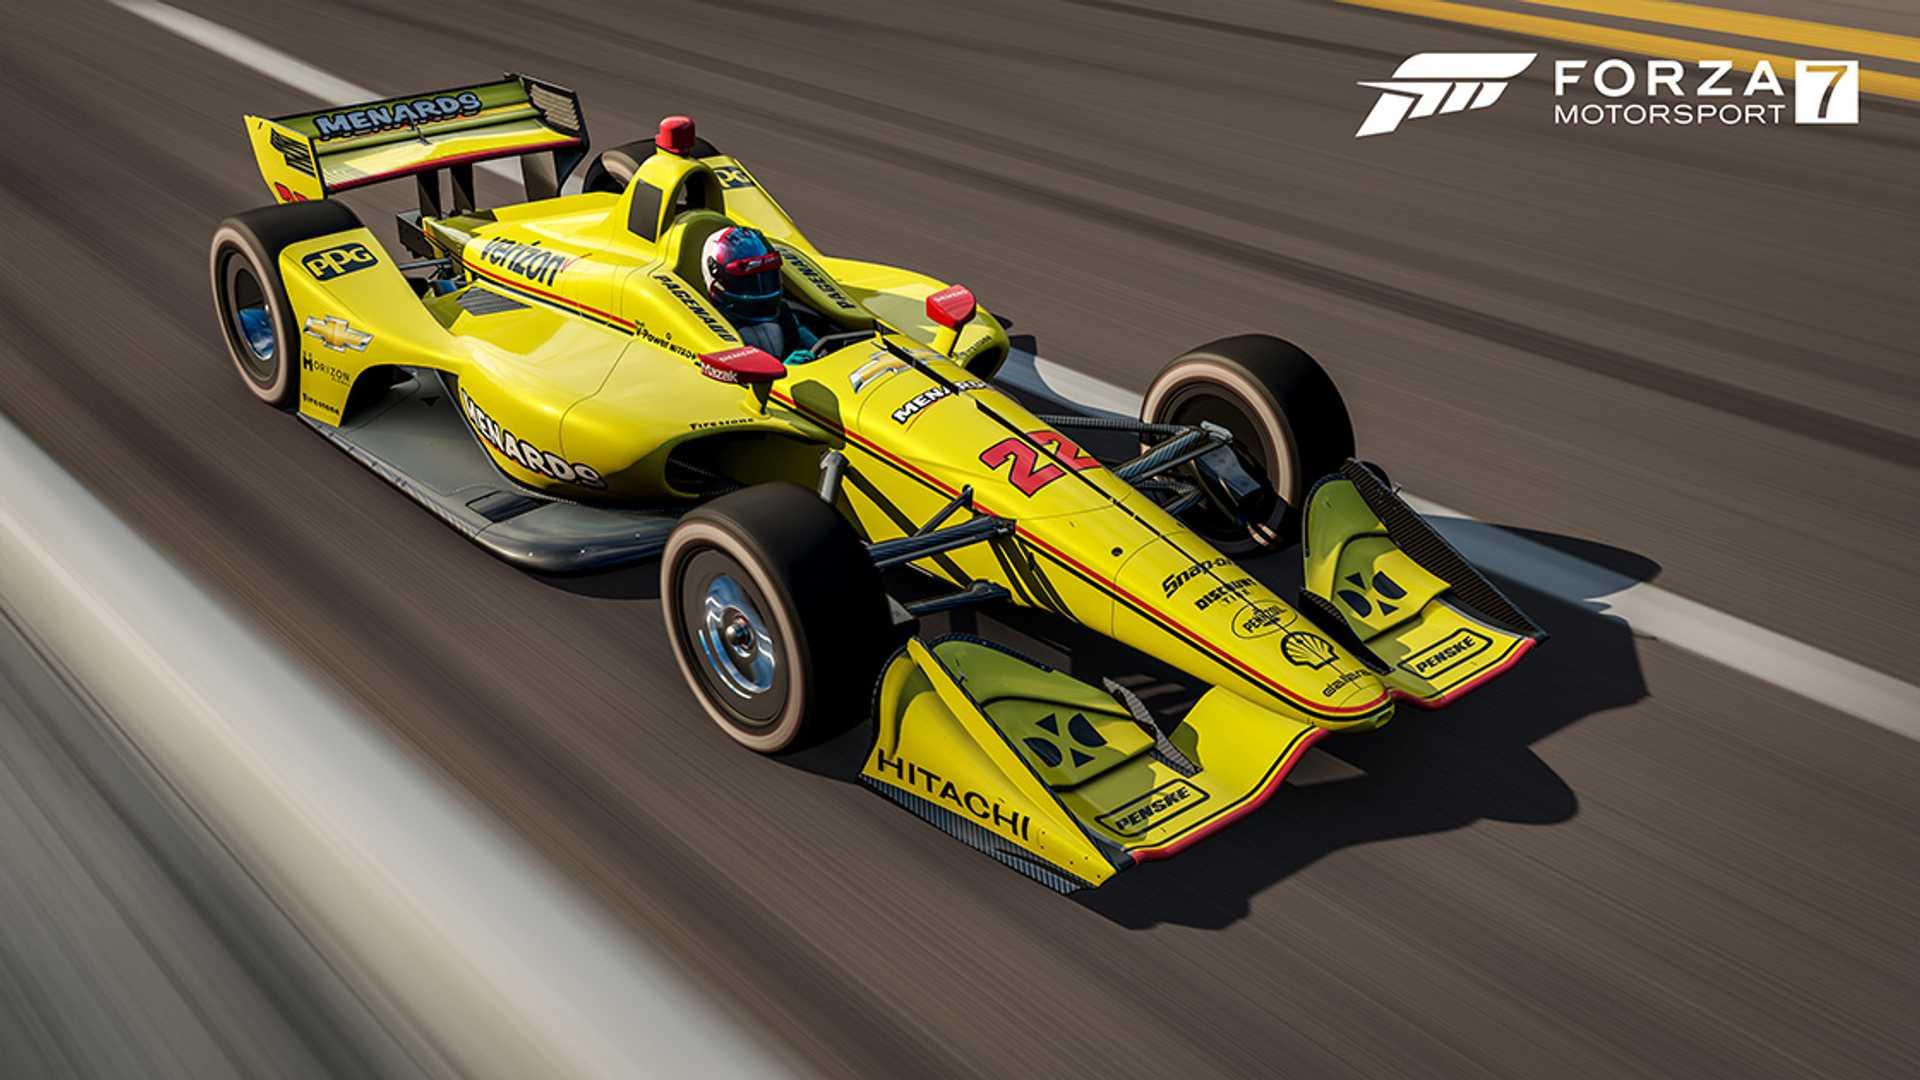 forza-motorsport-7-may-2019-update-3